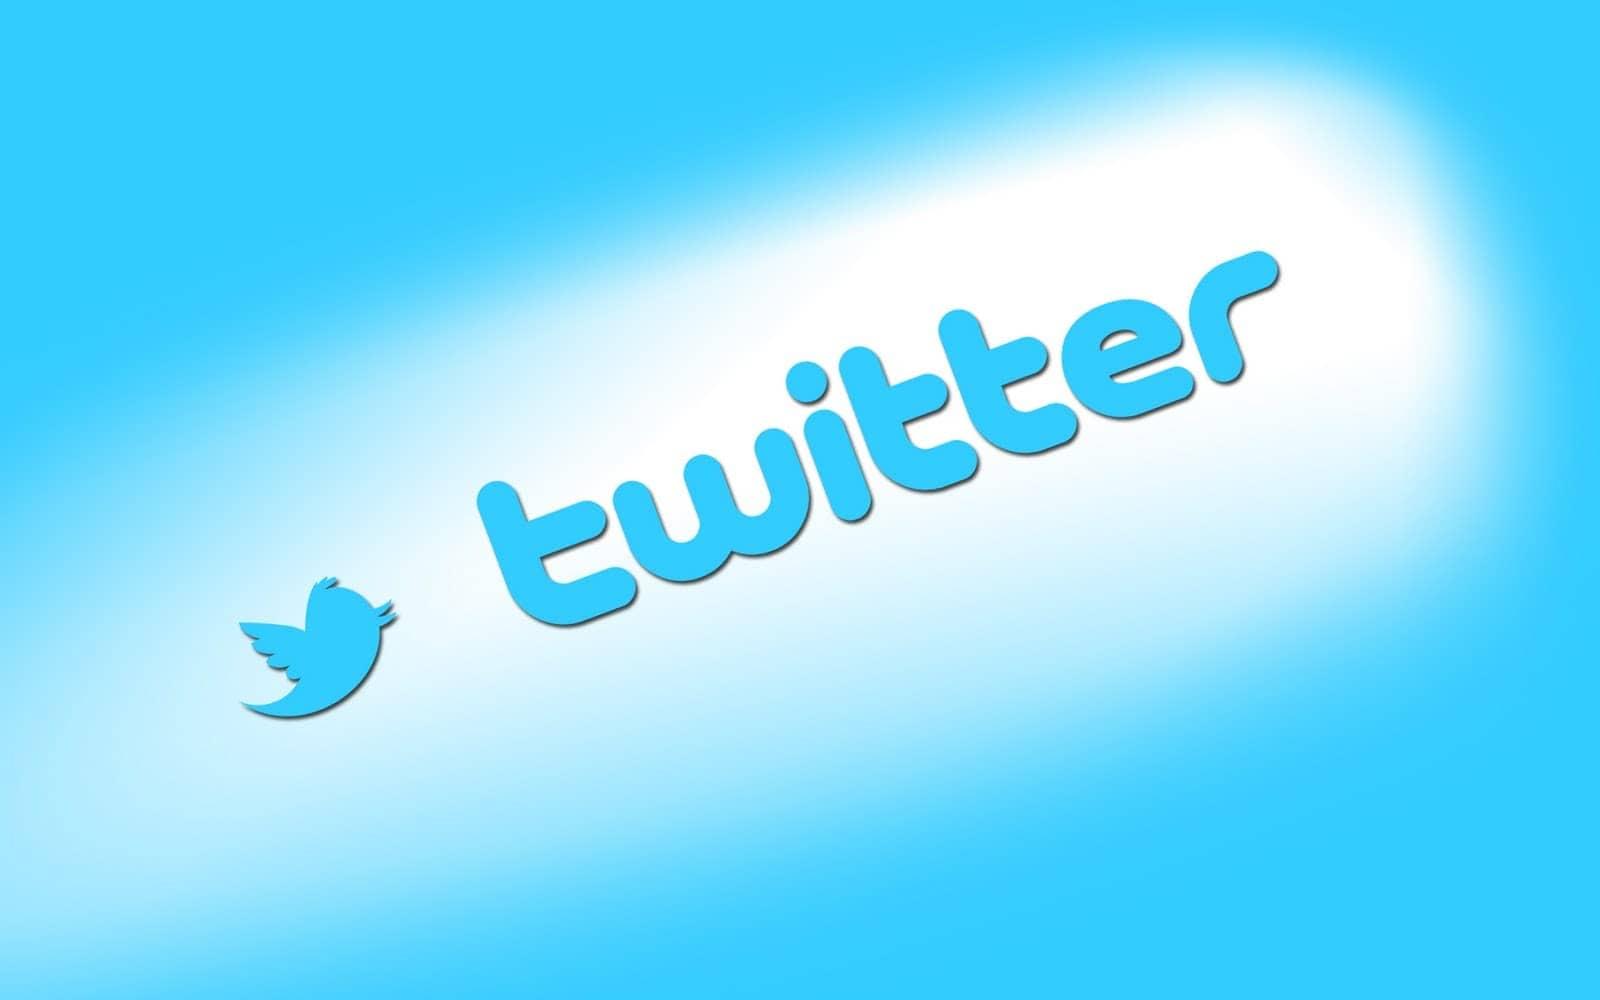 How to create twitter widget for your websites and blogs how to create twitter widget for your websites and blogs techtolead stopboris Images